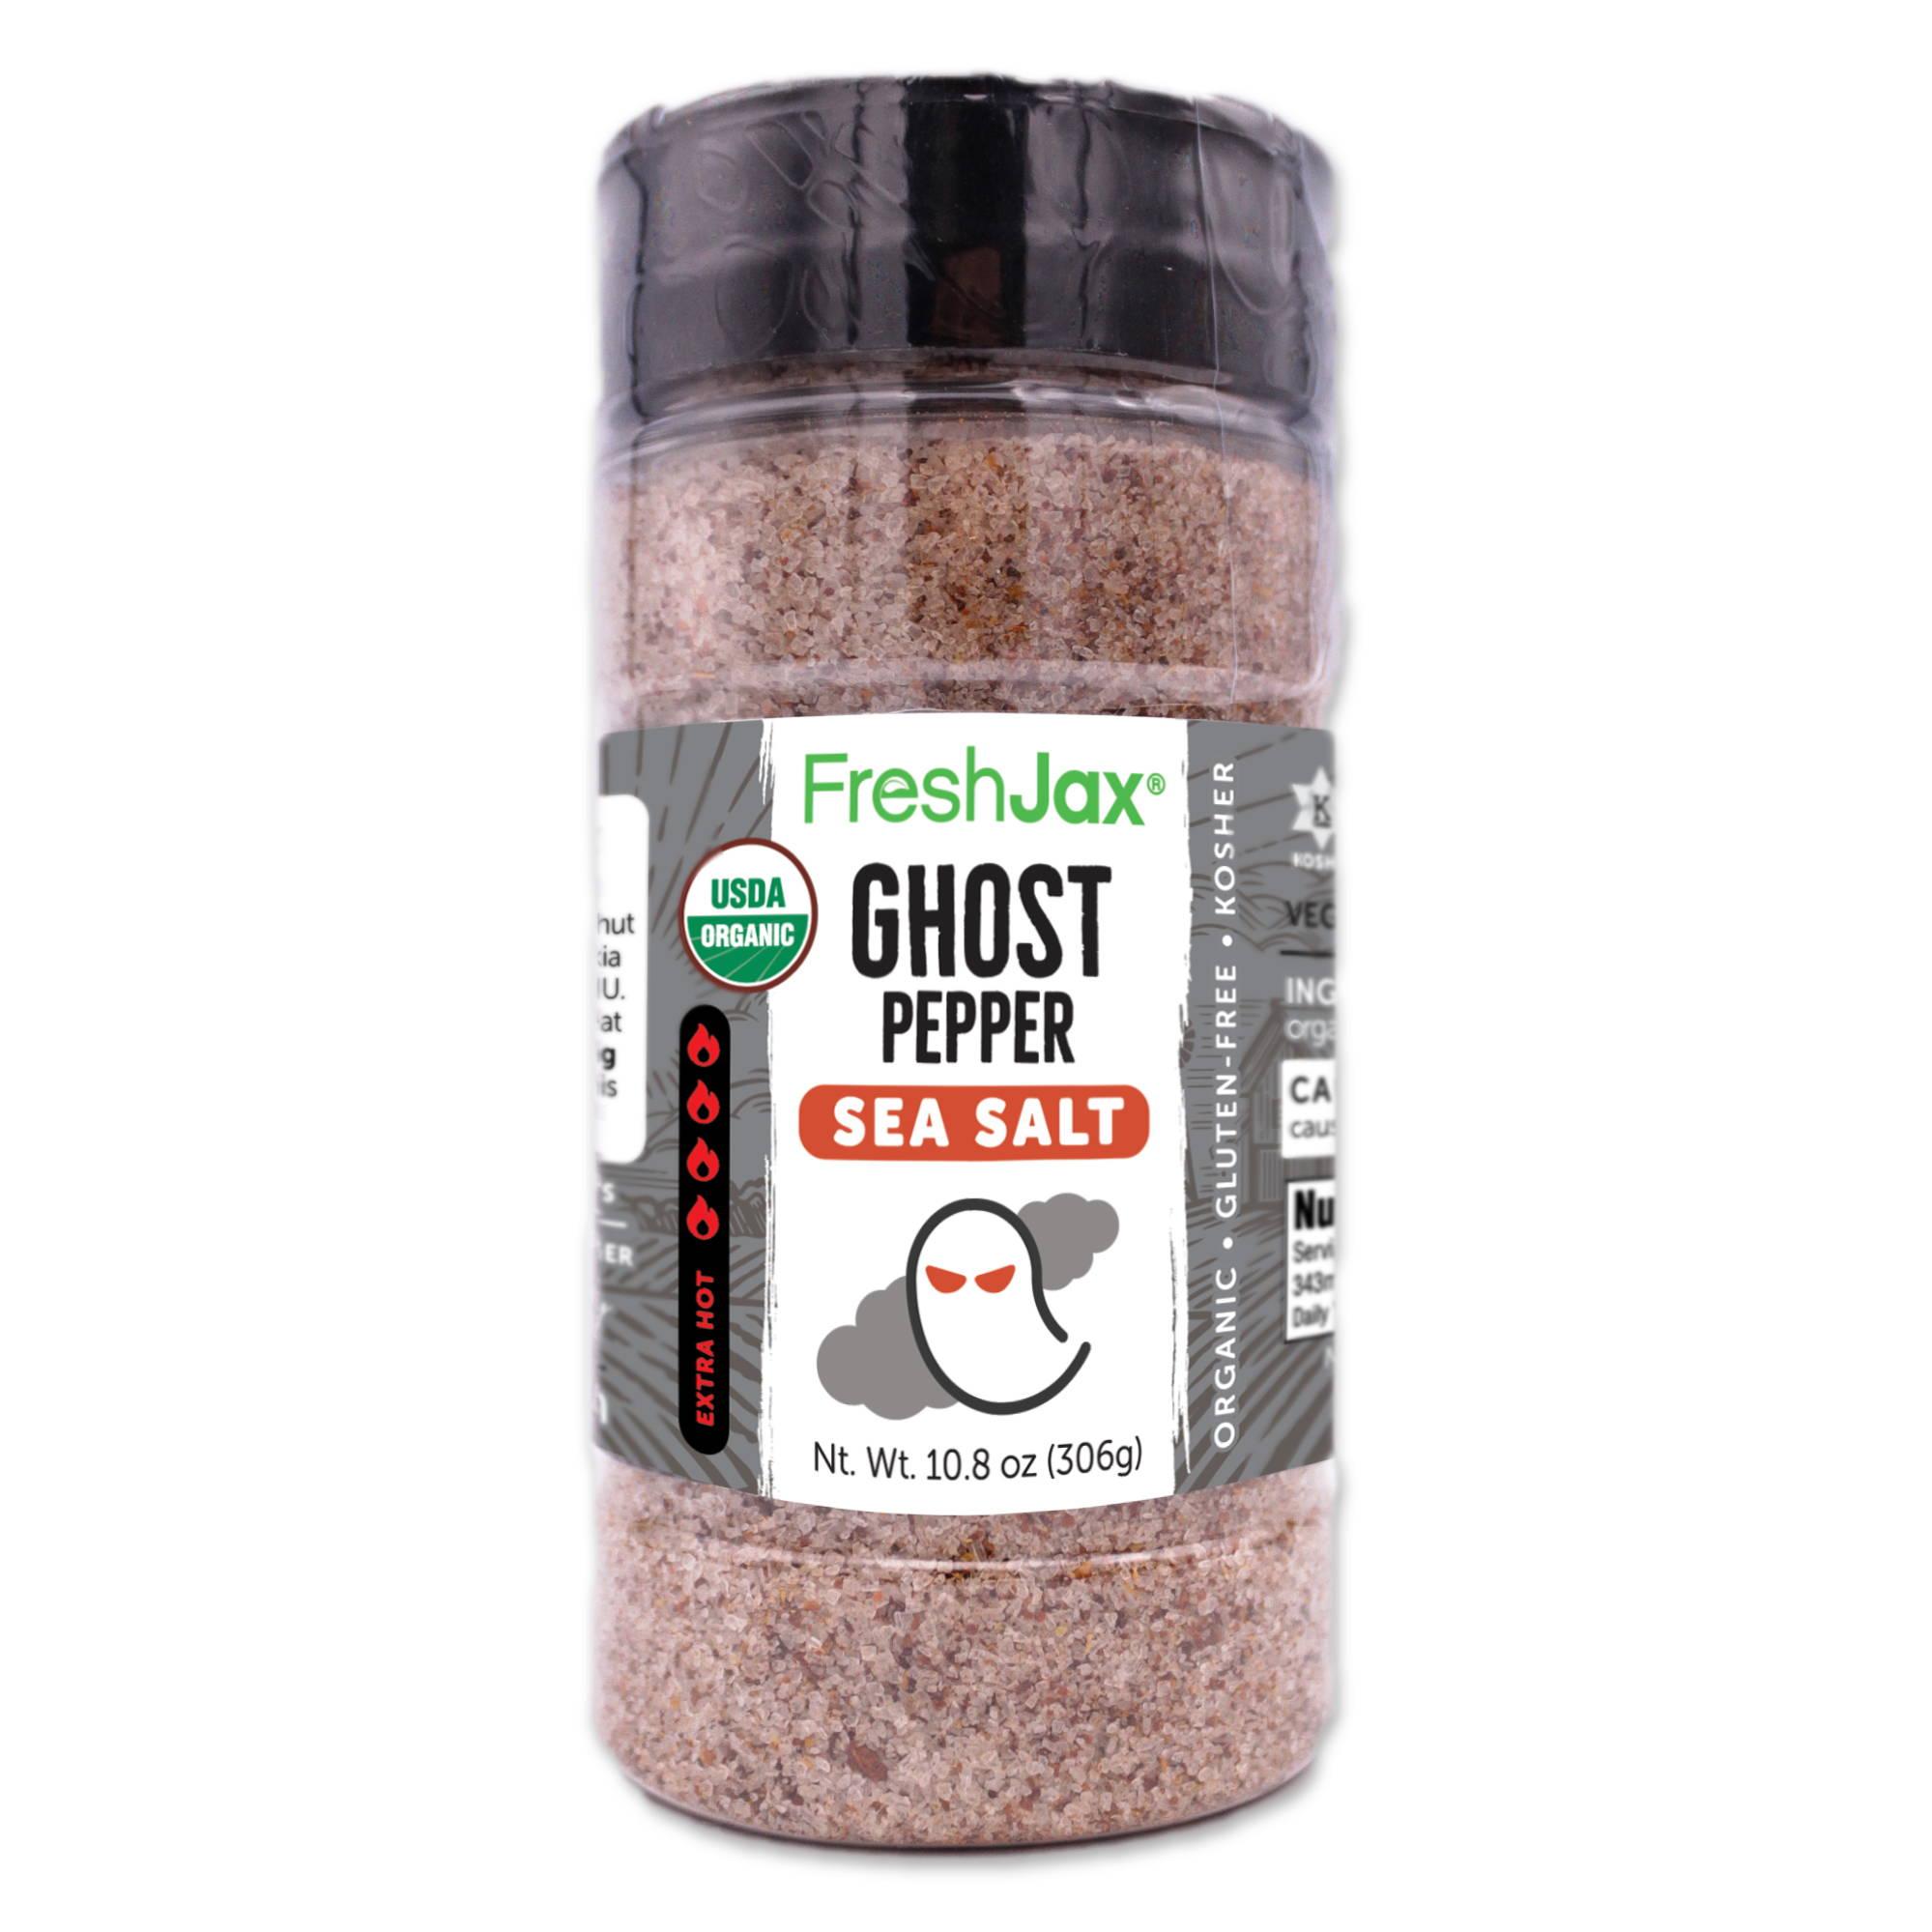 FreshJax Organic Spices, Ghost Pepper Sea Salt large bottle